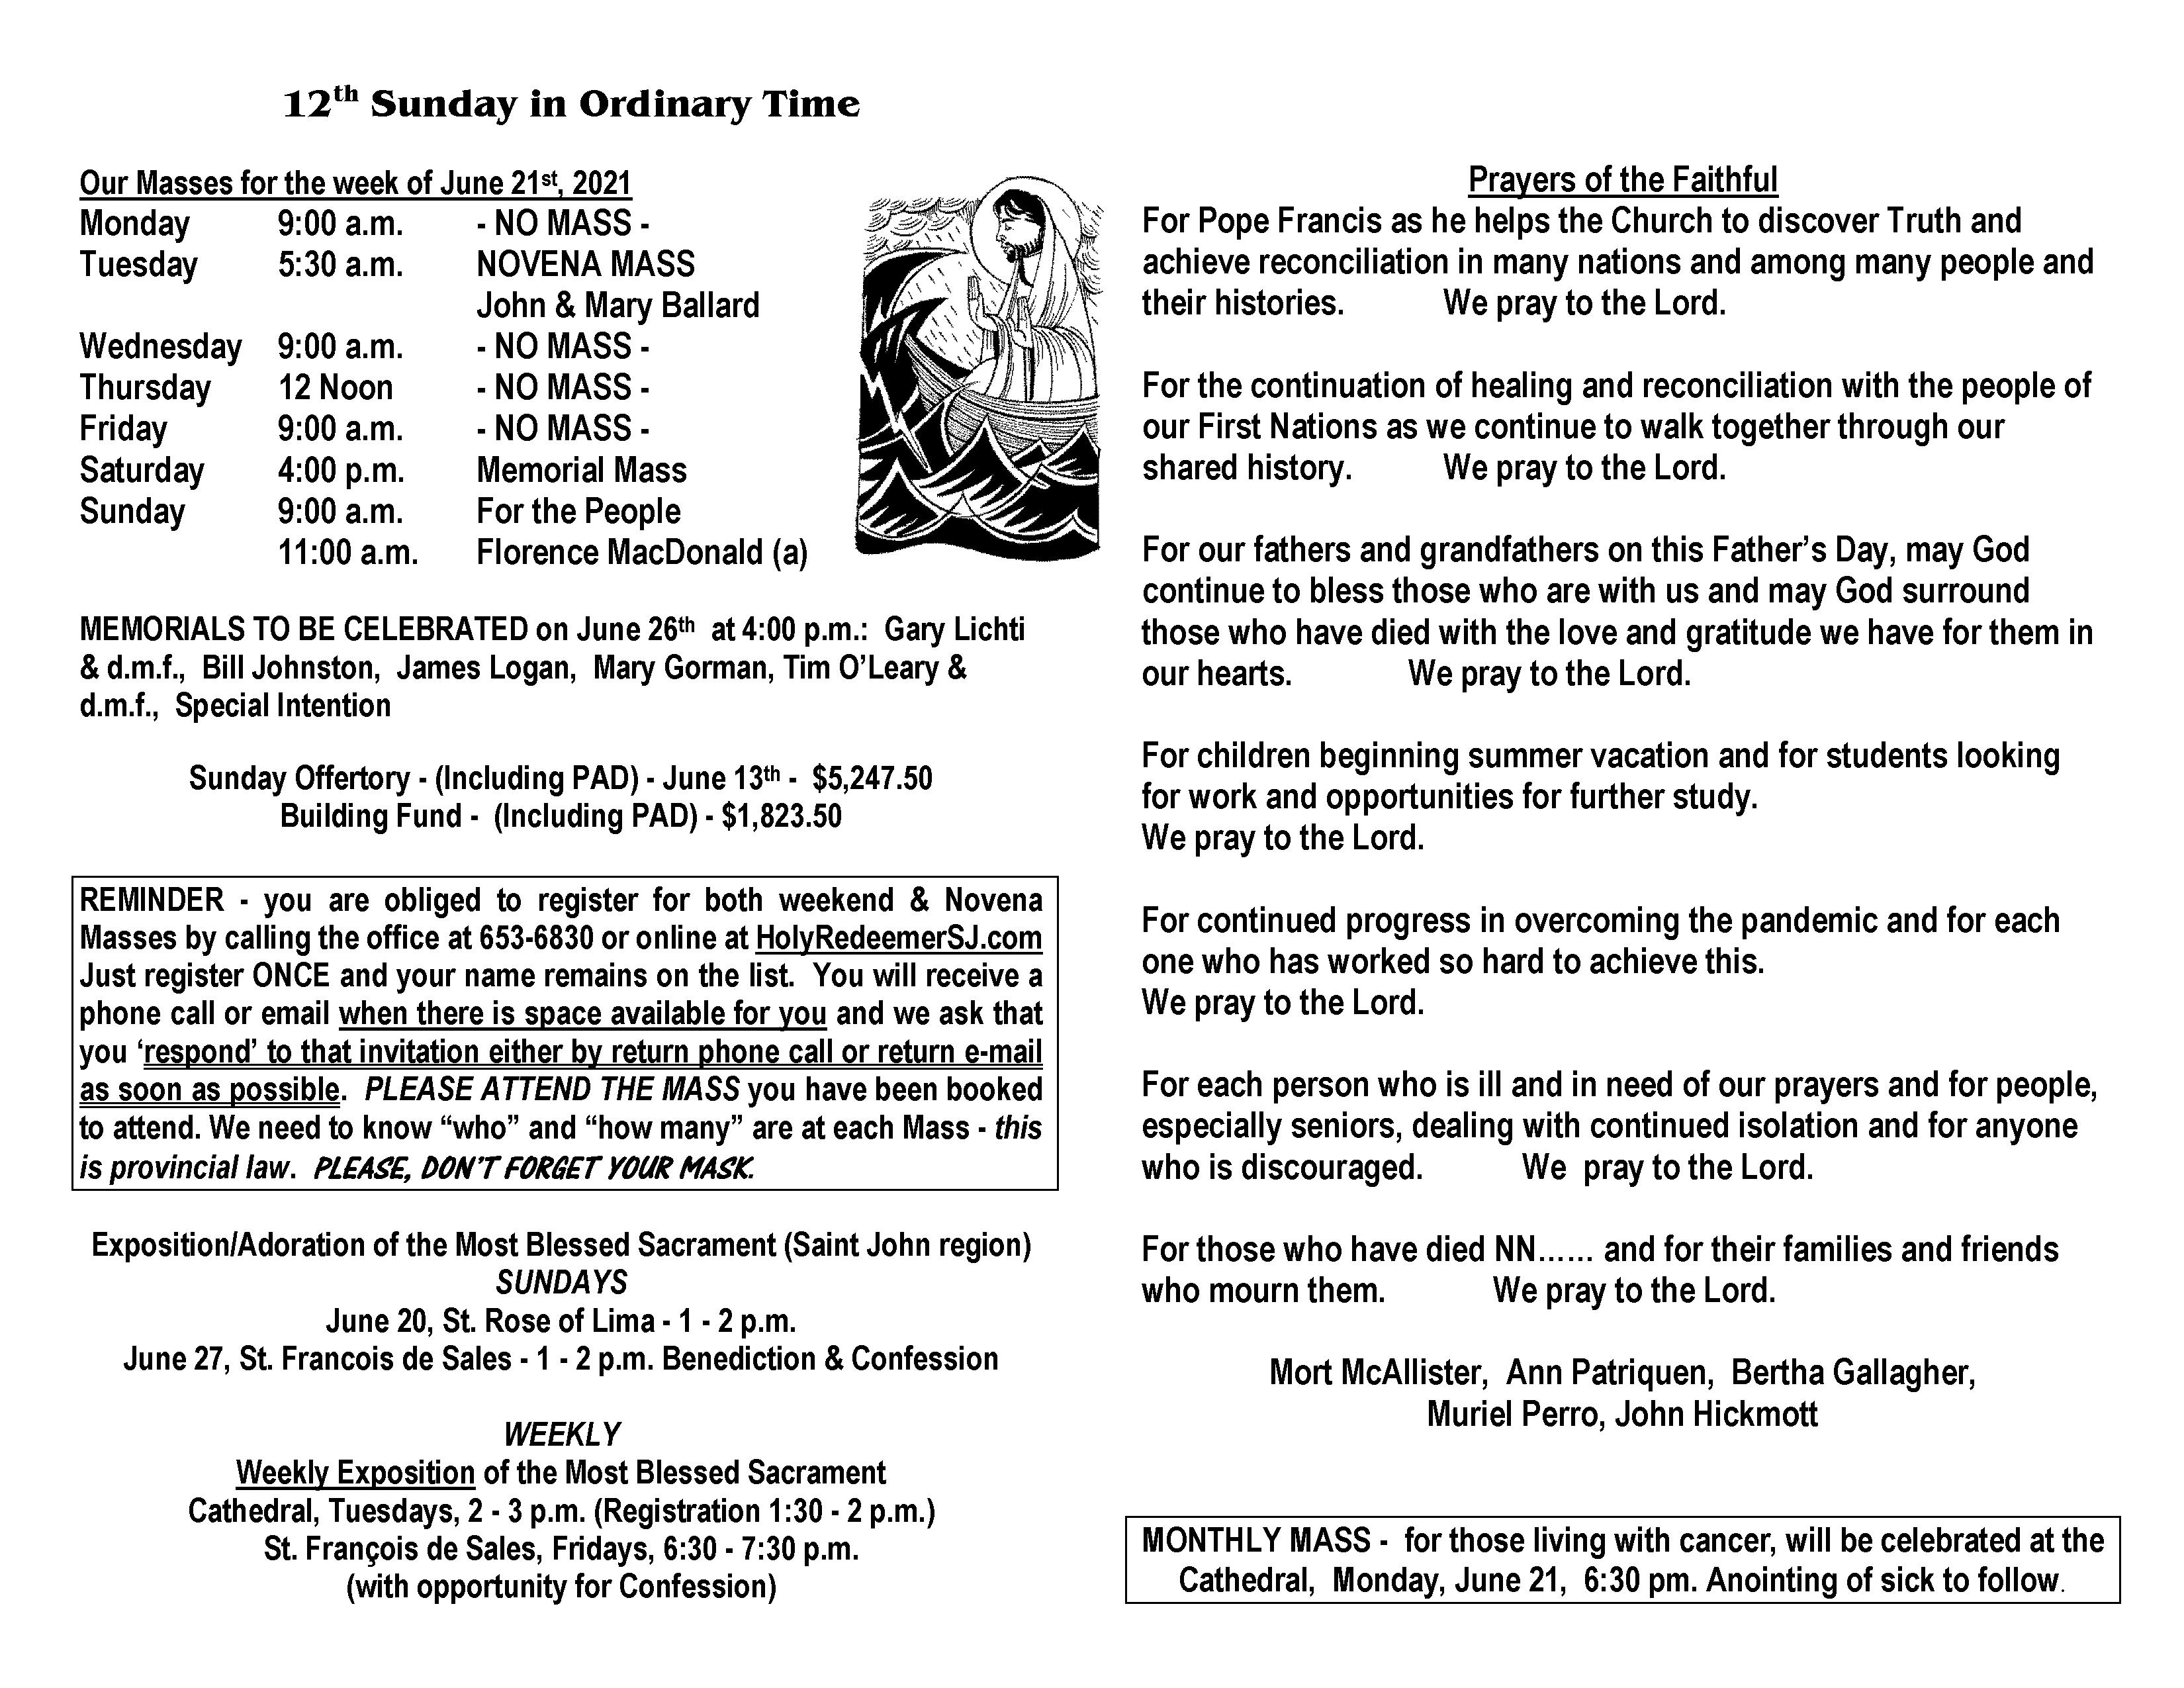 06-20-21